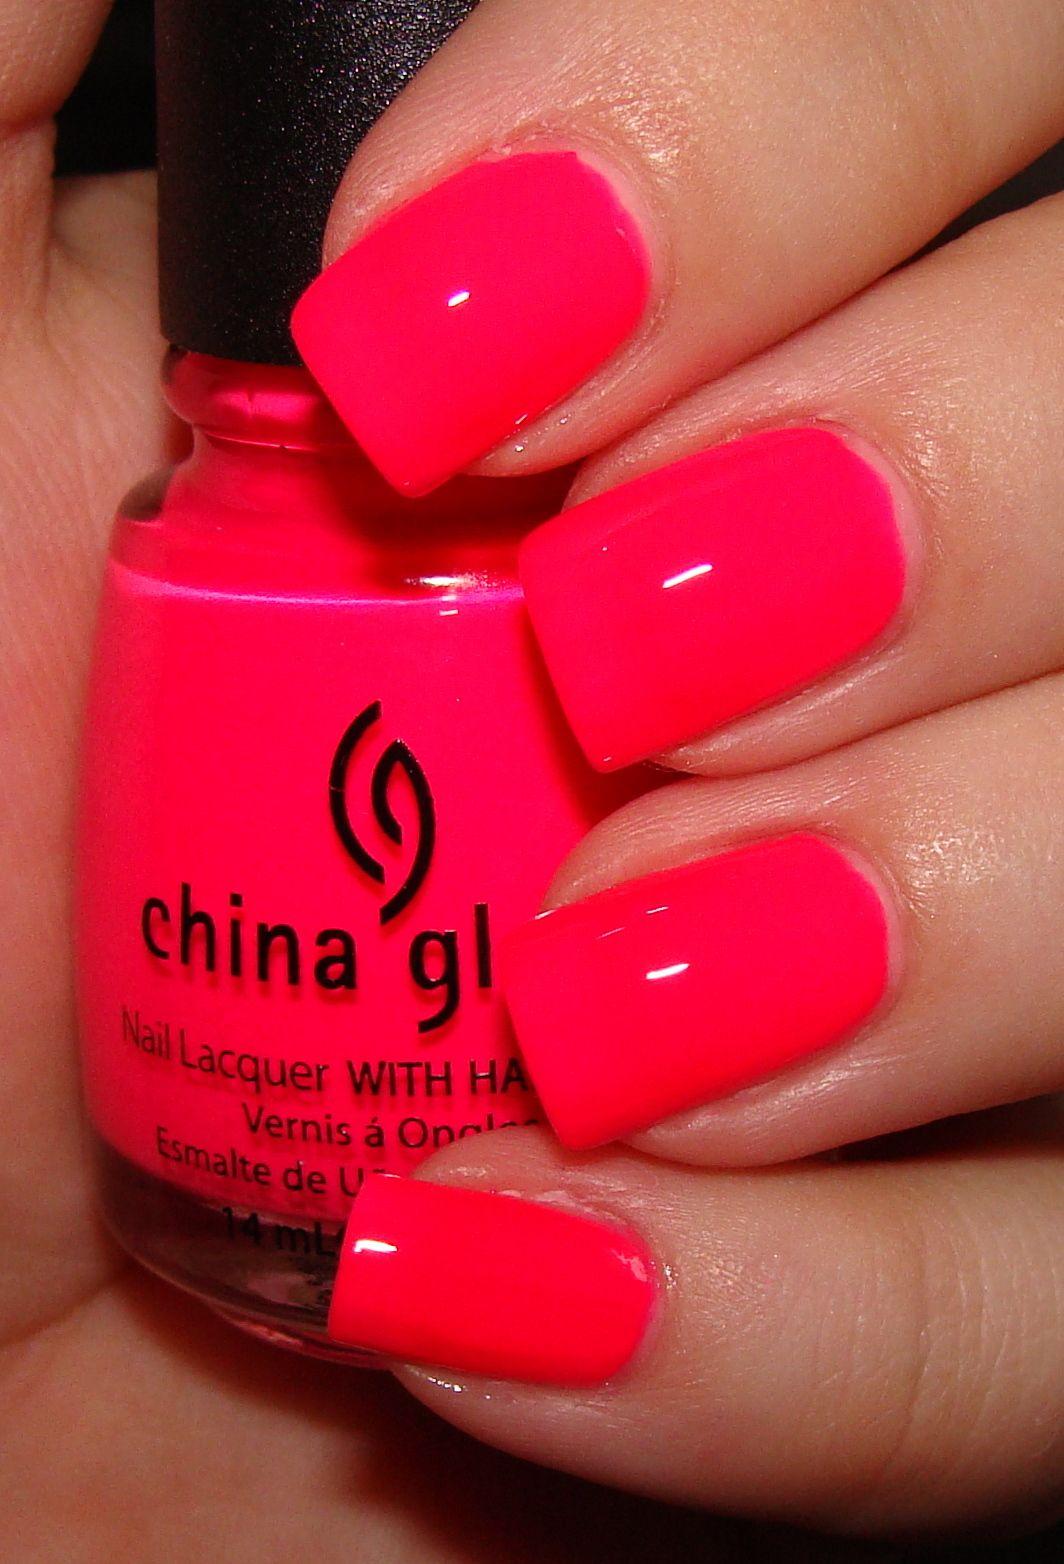 China Glaze Nail Polish - 14ml - Reds & Corals - You ...   1064 x 1564 jpeg 642kB